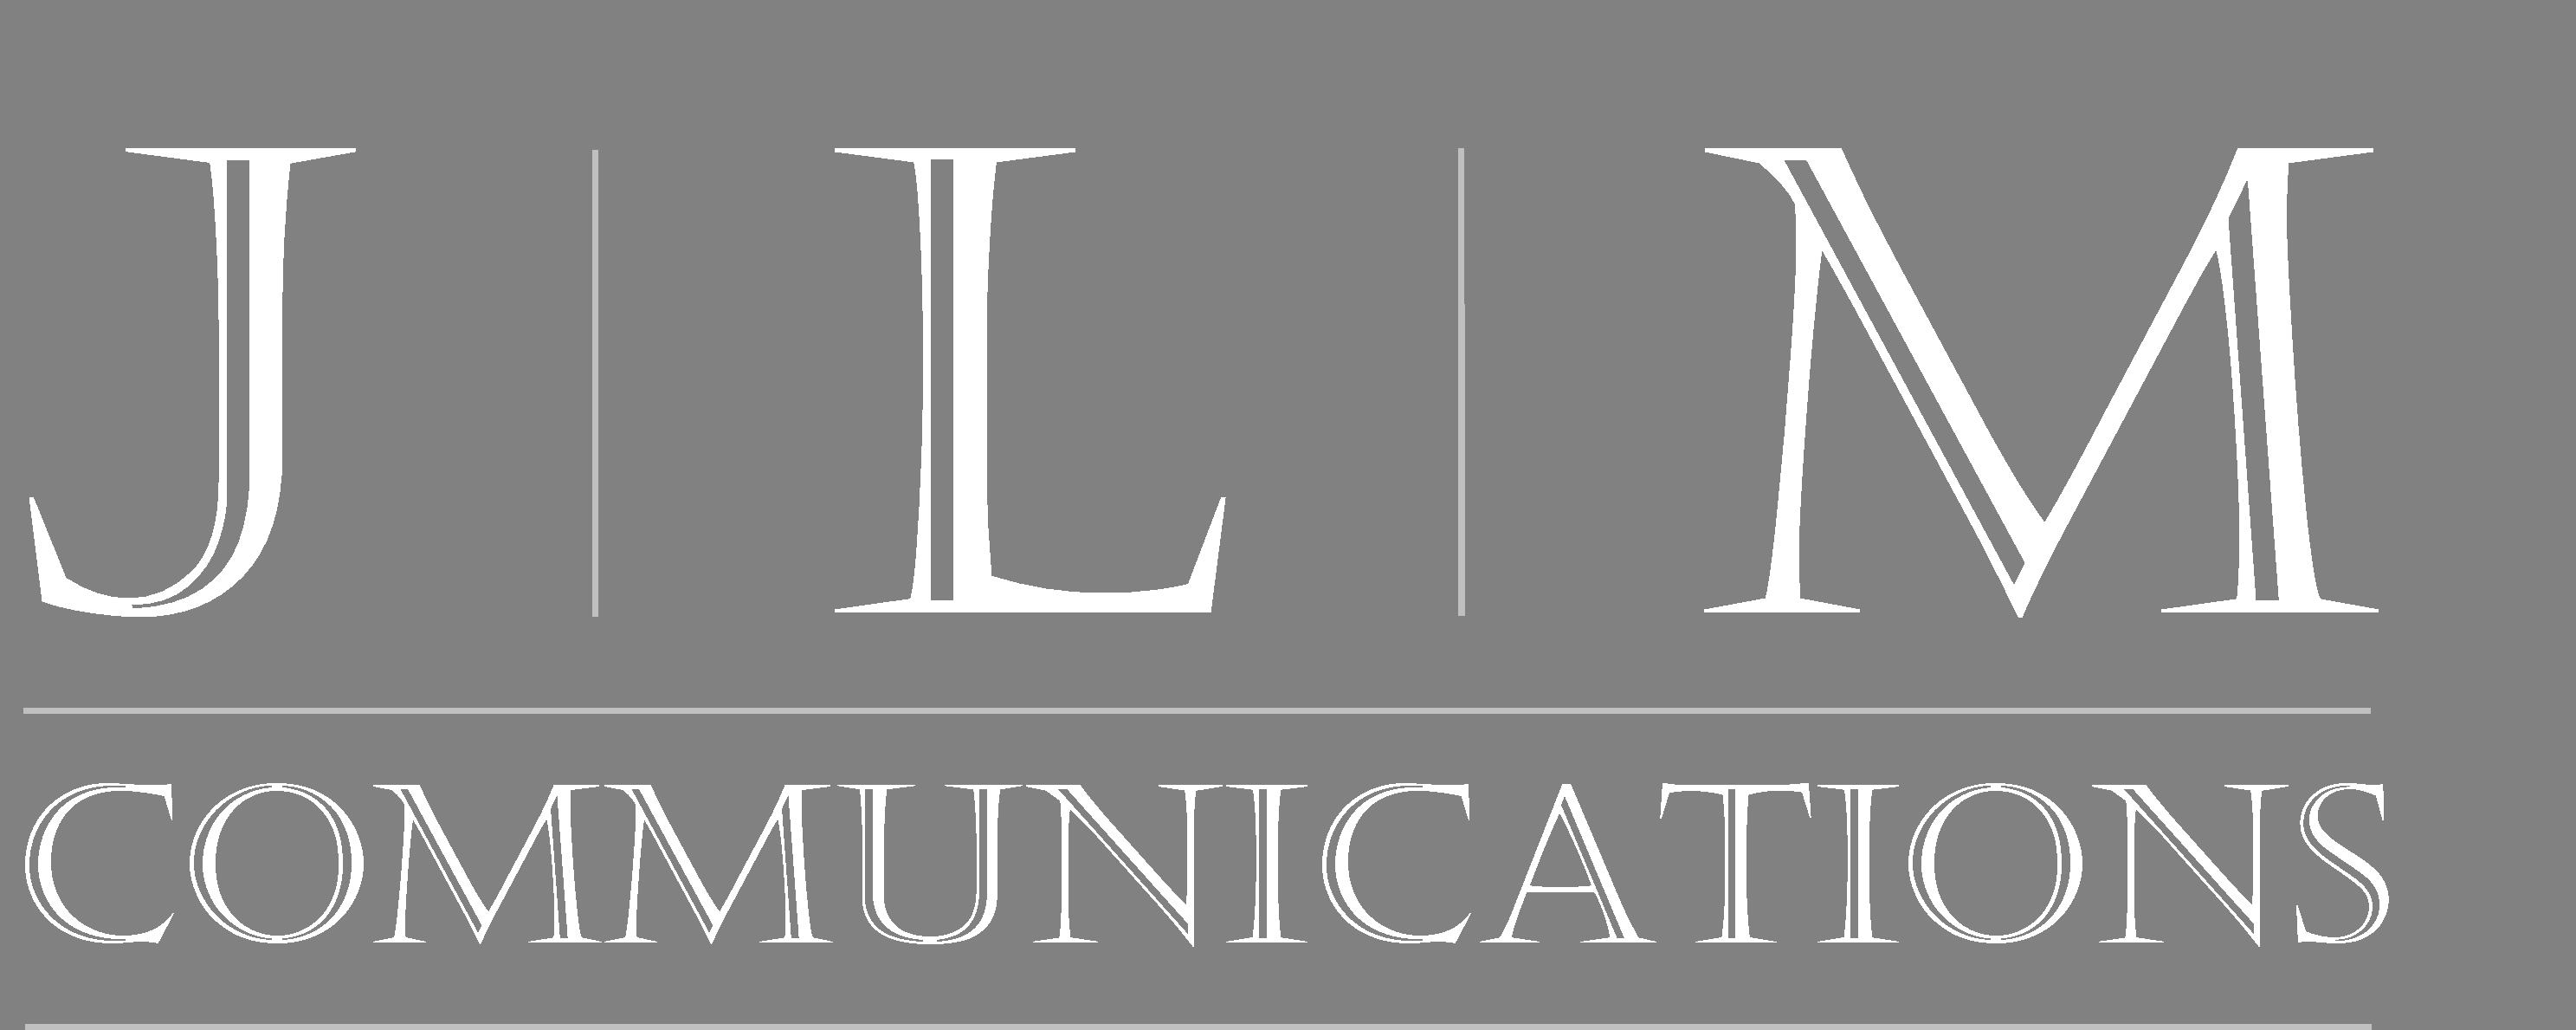 JLM Communications Logo